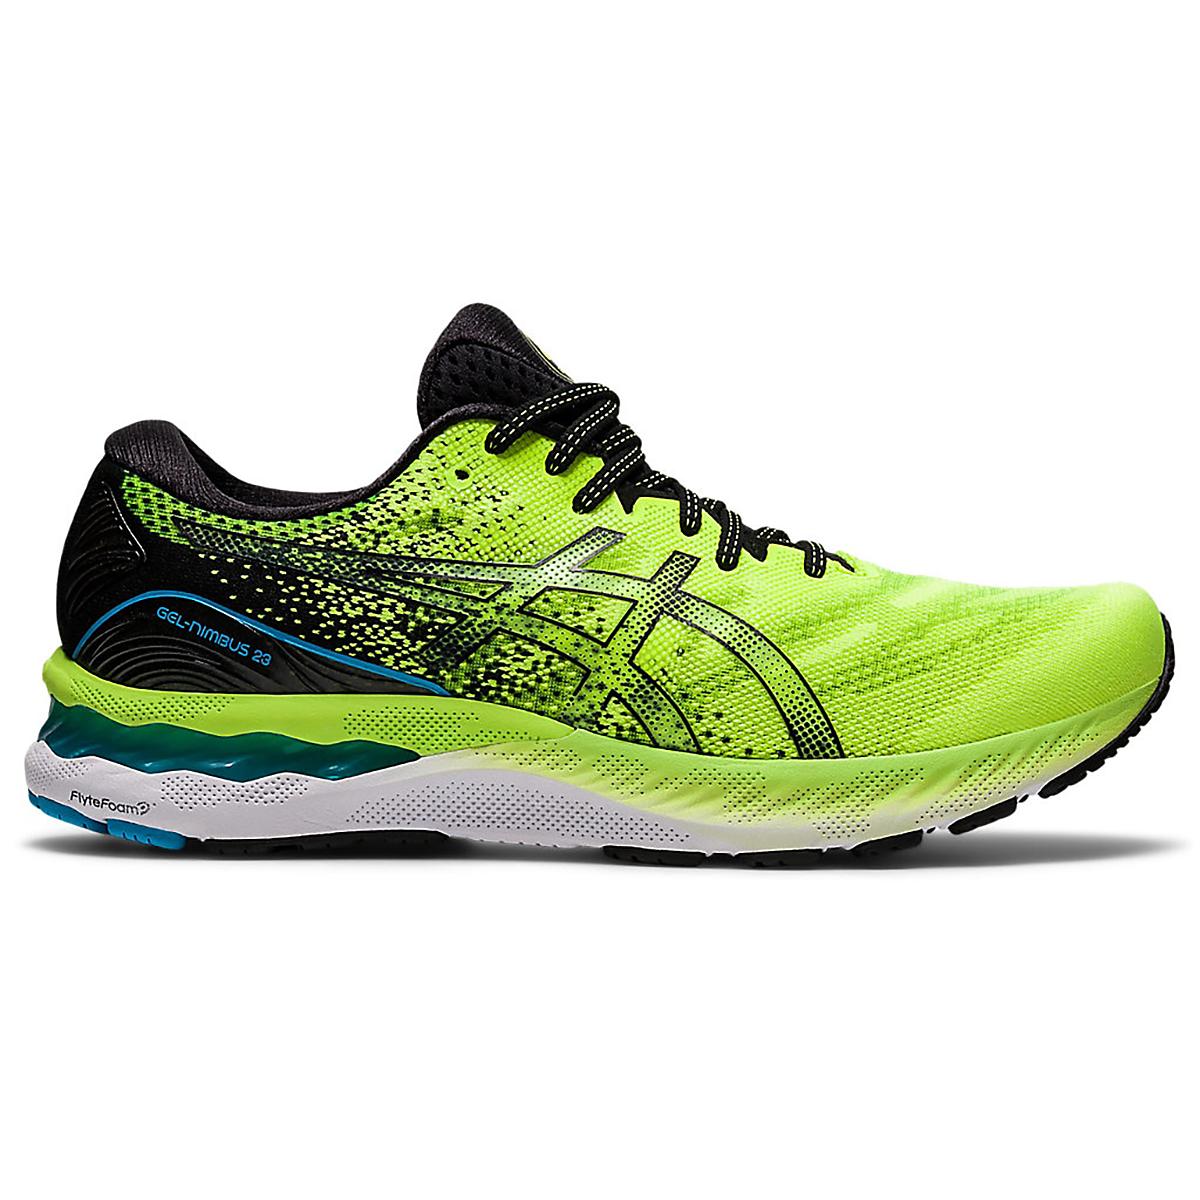 Men's Asics Gel-Nimbus 23 Running Shoe - Color: Hazard Green/Black - Size: 7 - Width: Regular, Hazard Green/Black, large, image 1